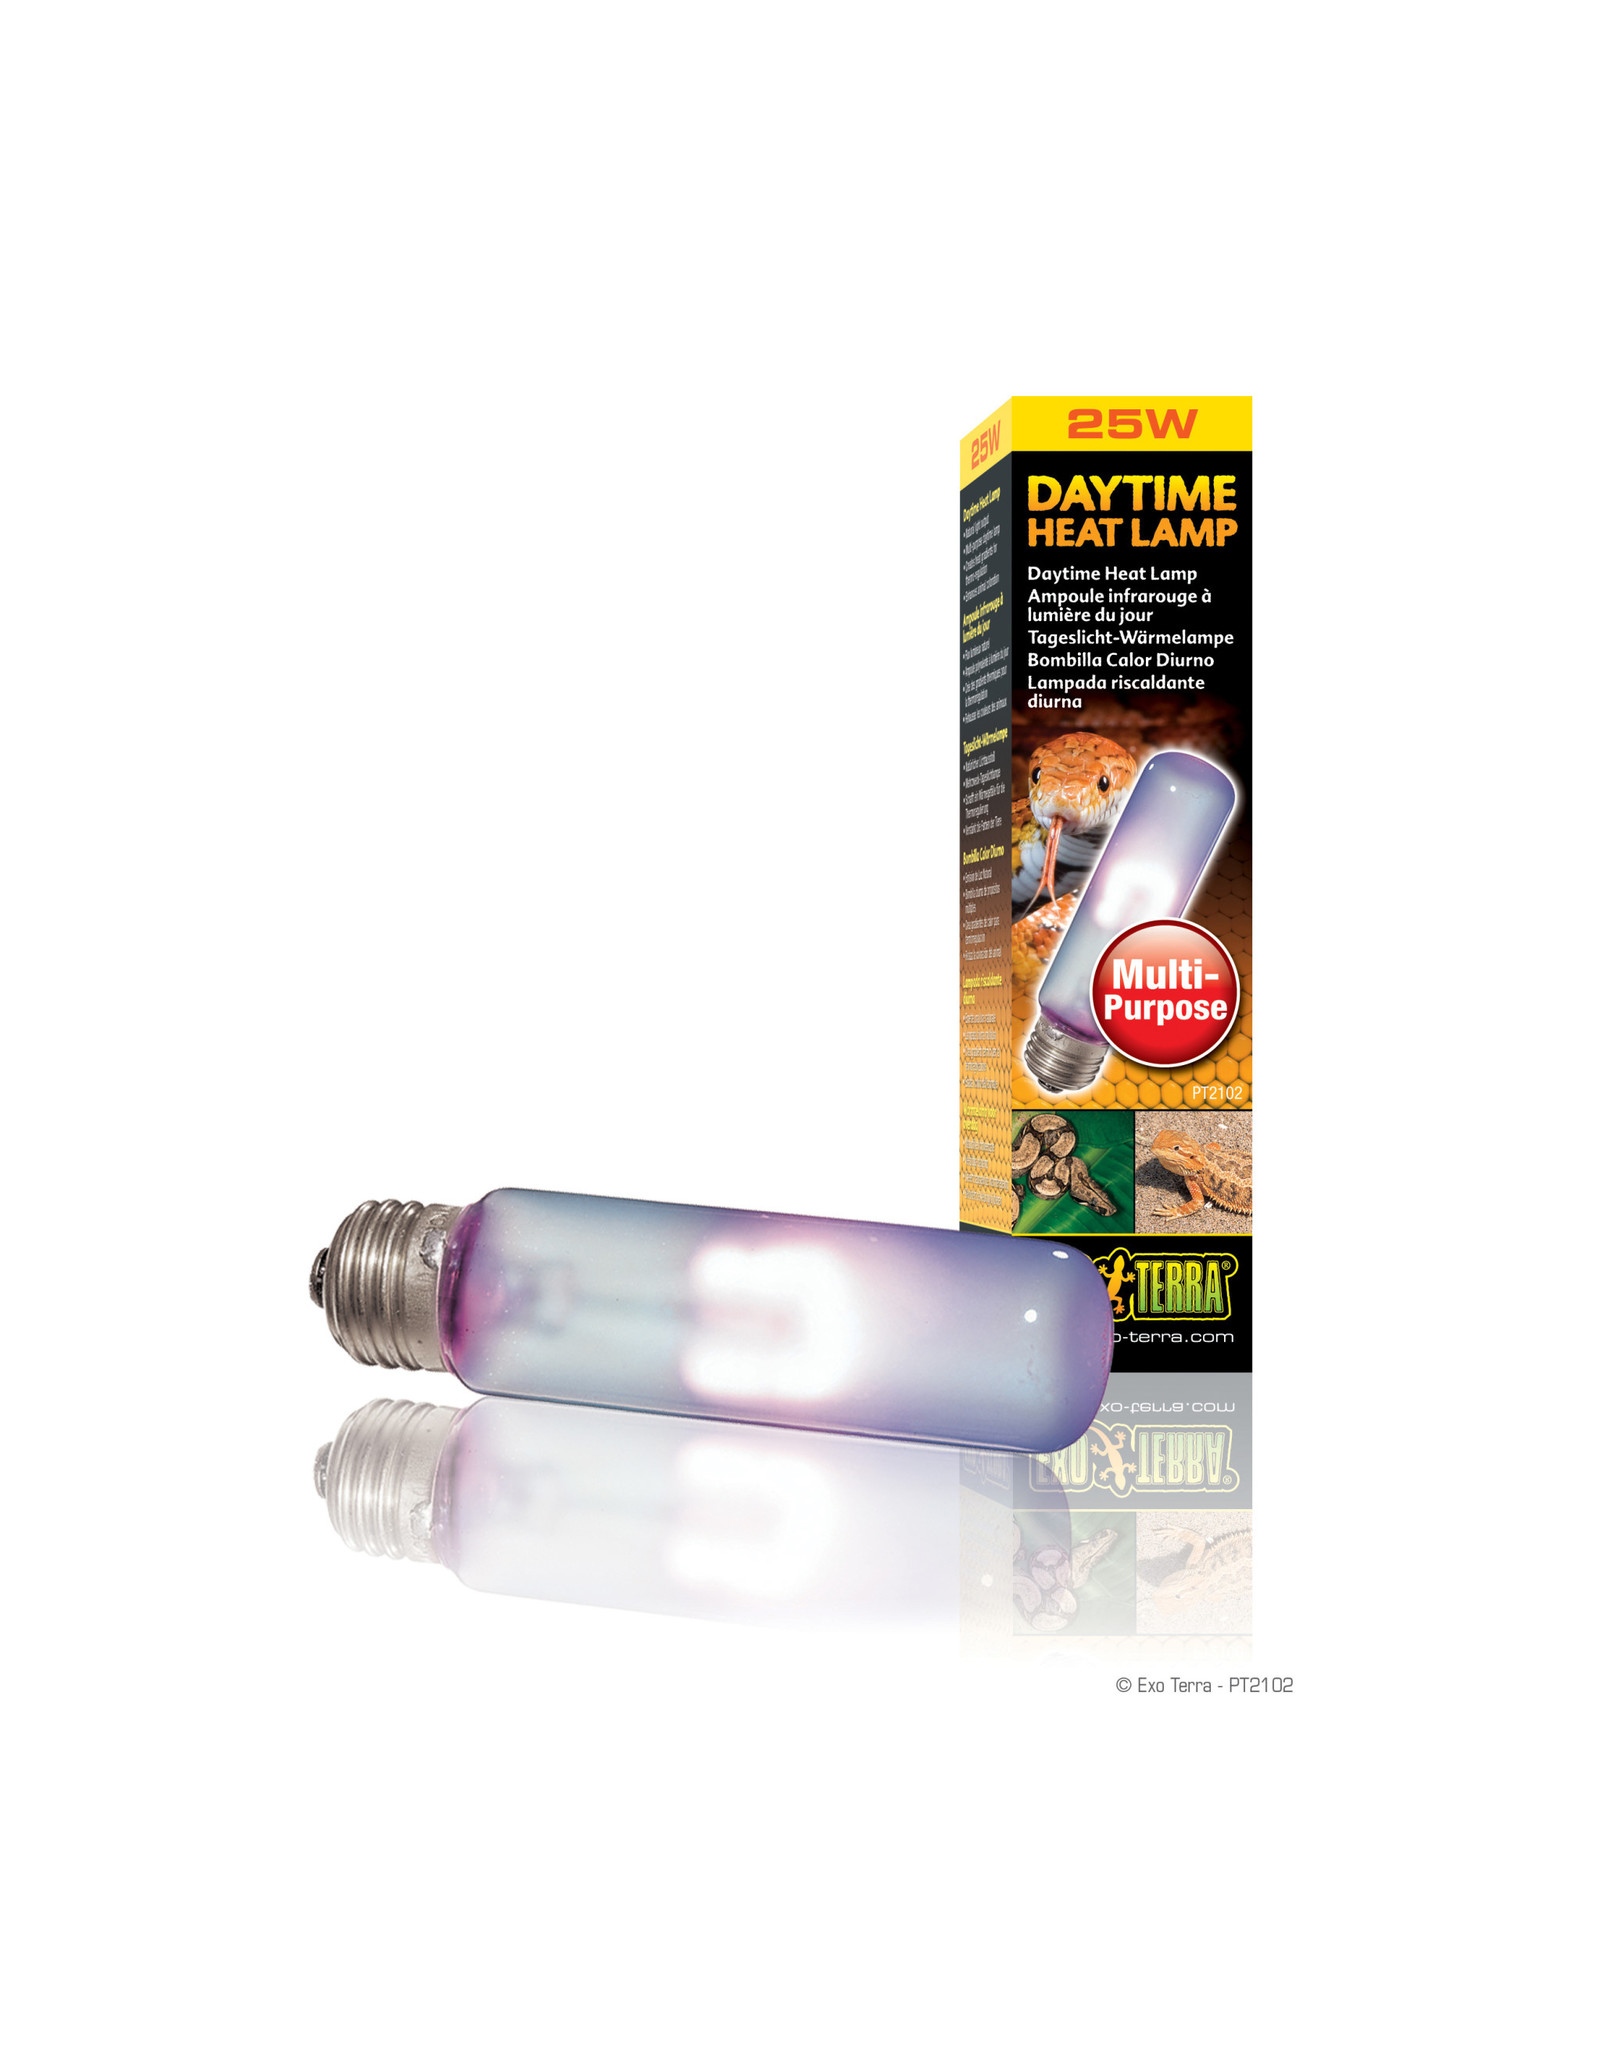 Exo Terra Daytime Heat Lamp T10/25W